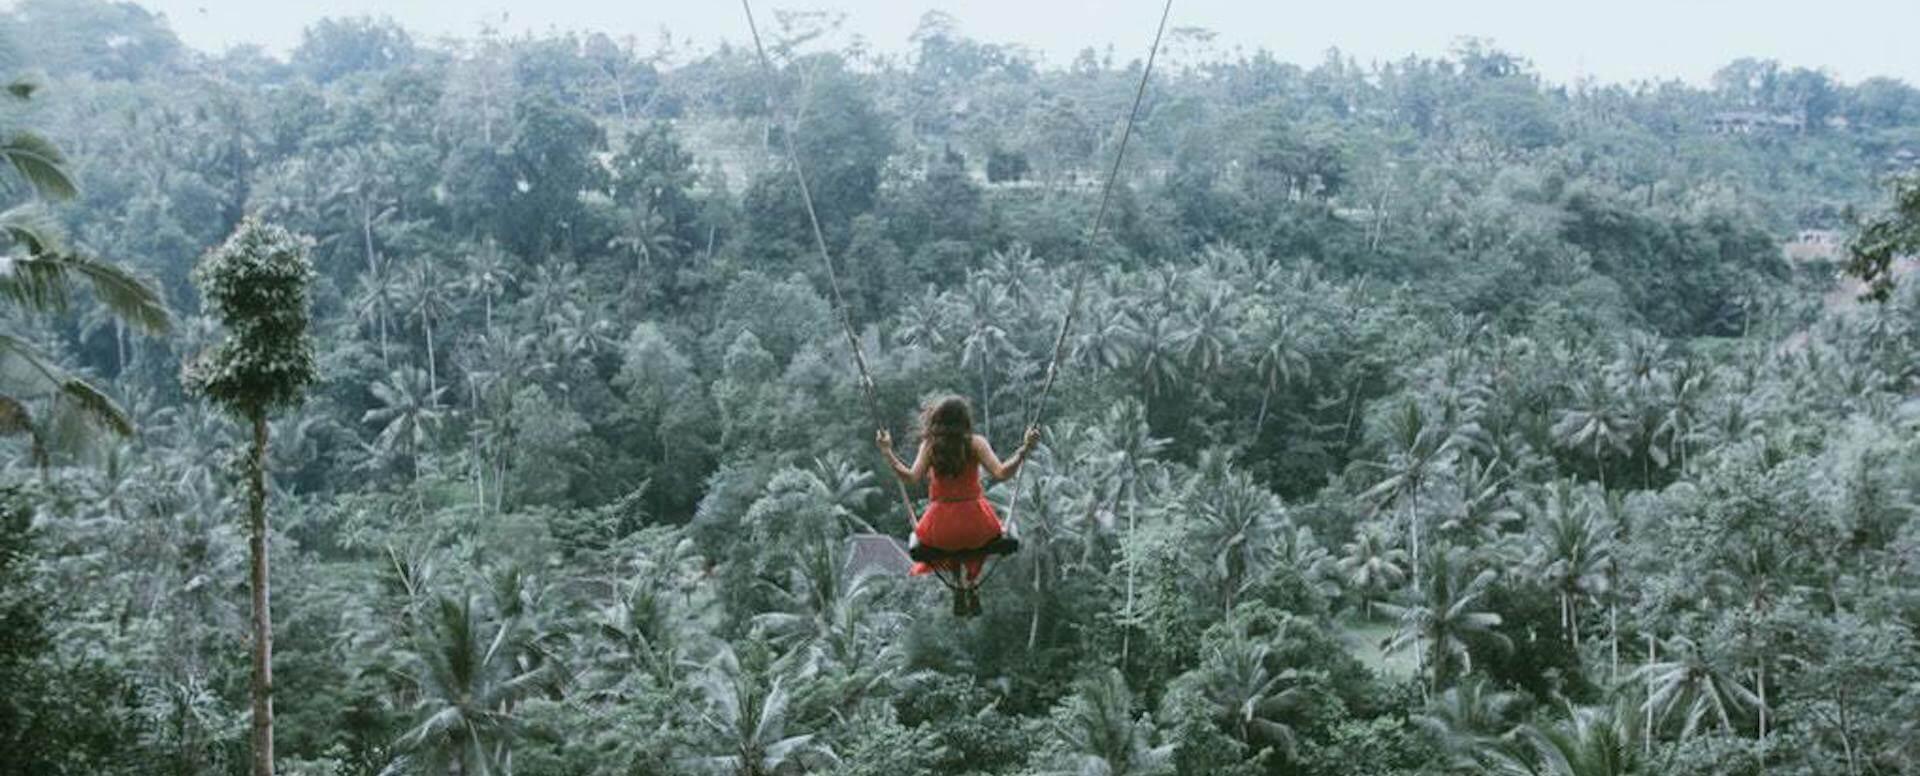 Parcs nationaux - Indonésie